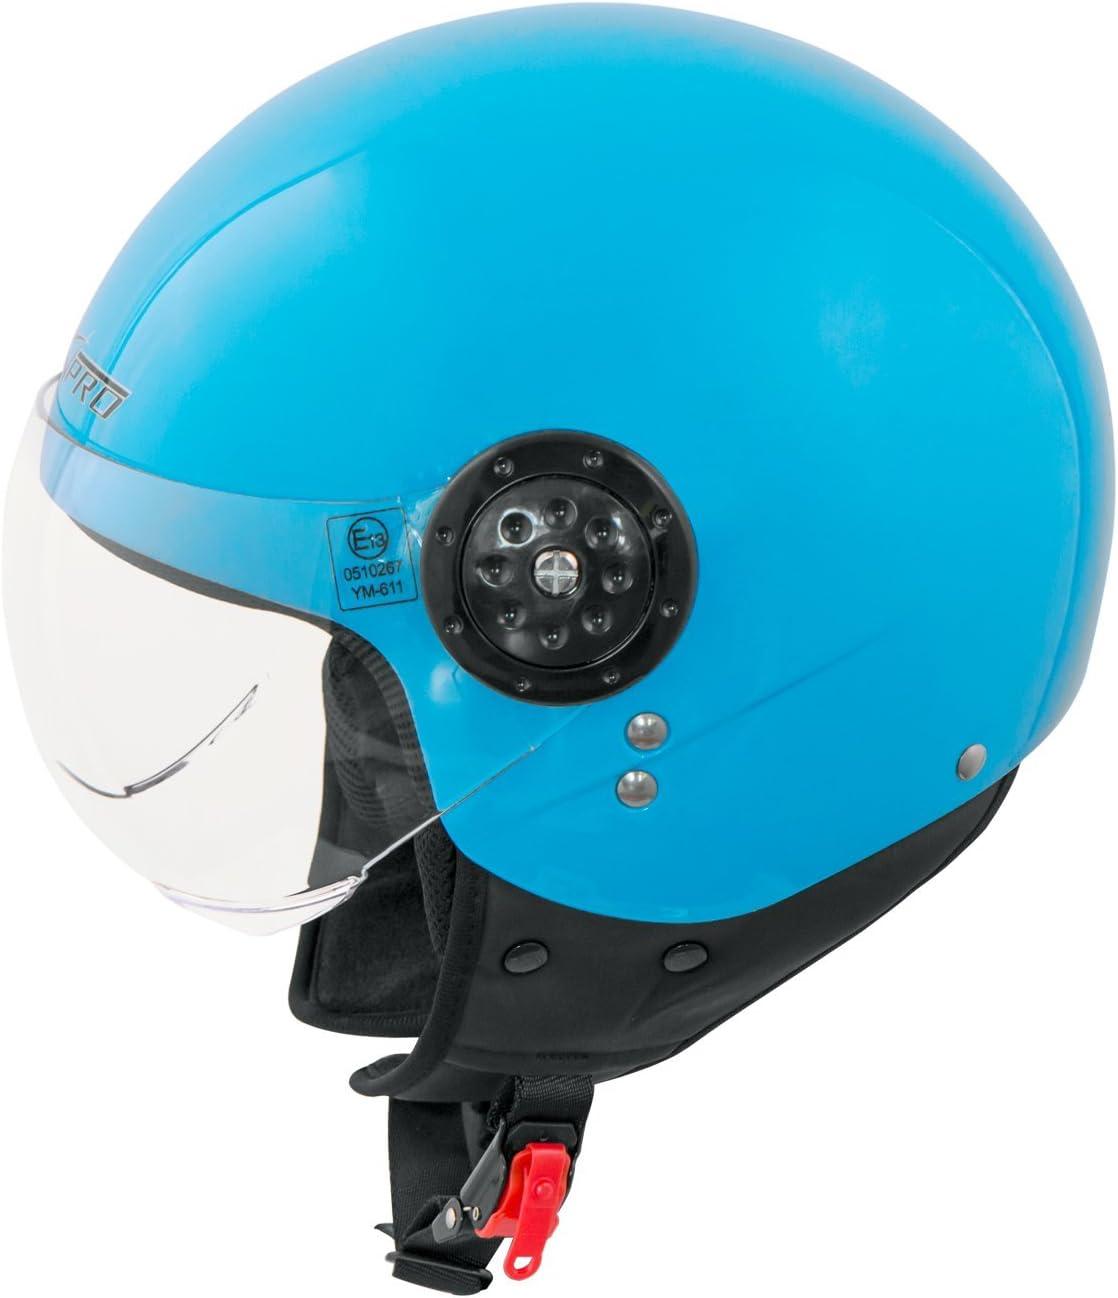 Motorradhelm Motorrad Roller Jet Demi Helm Scooter Homologiert Avio Visor schwarz XS